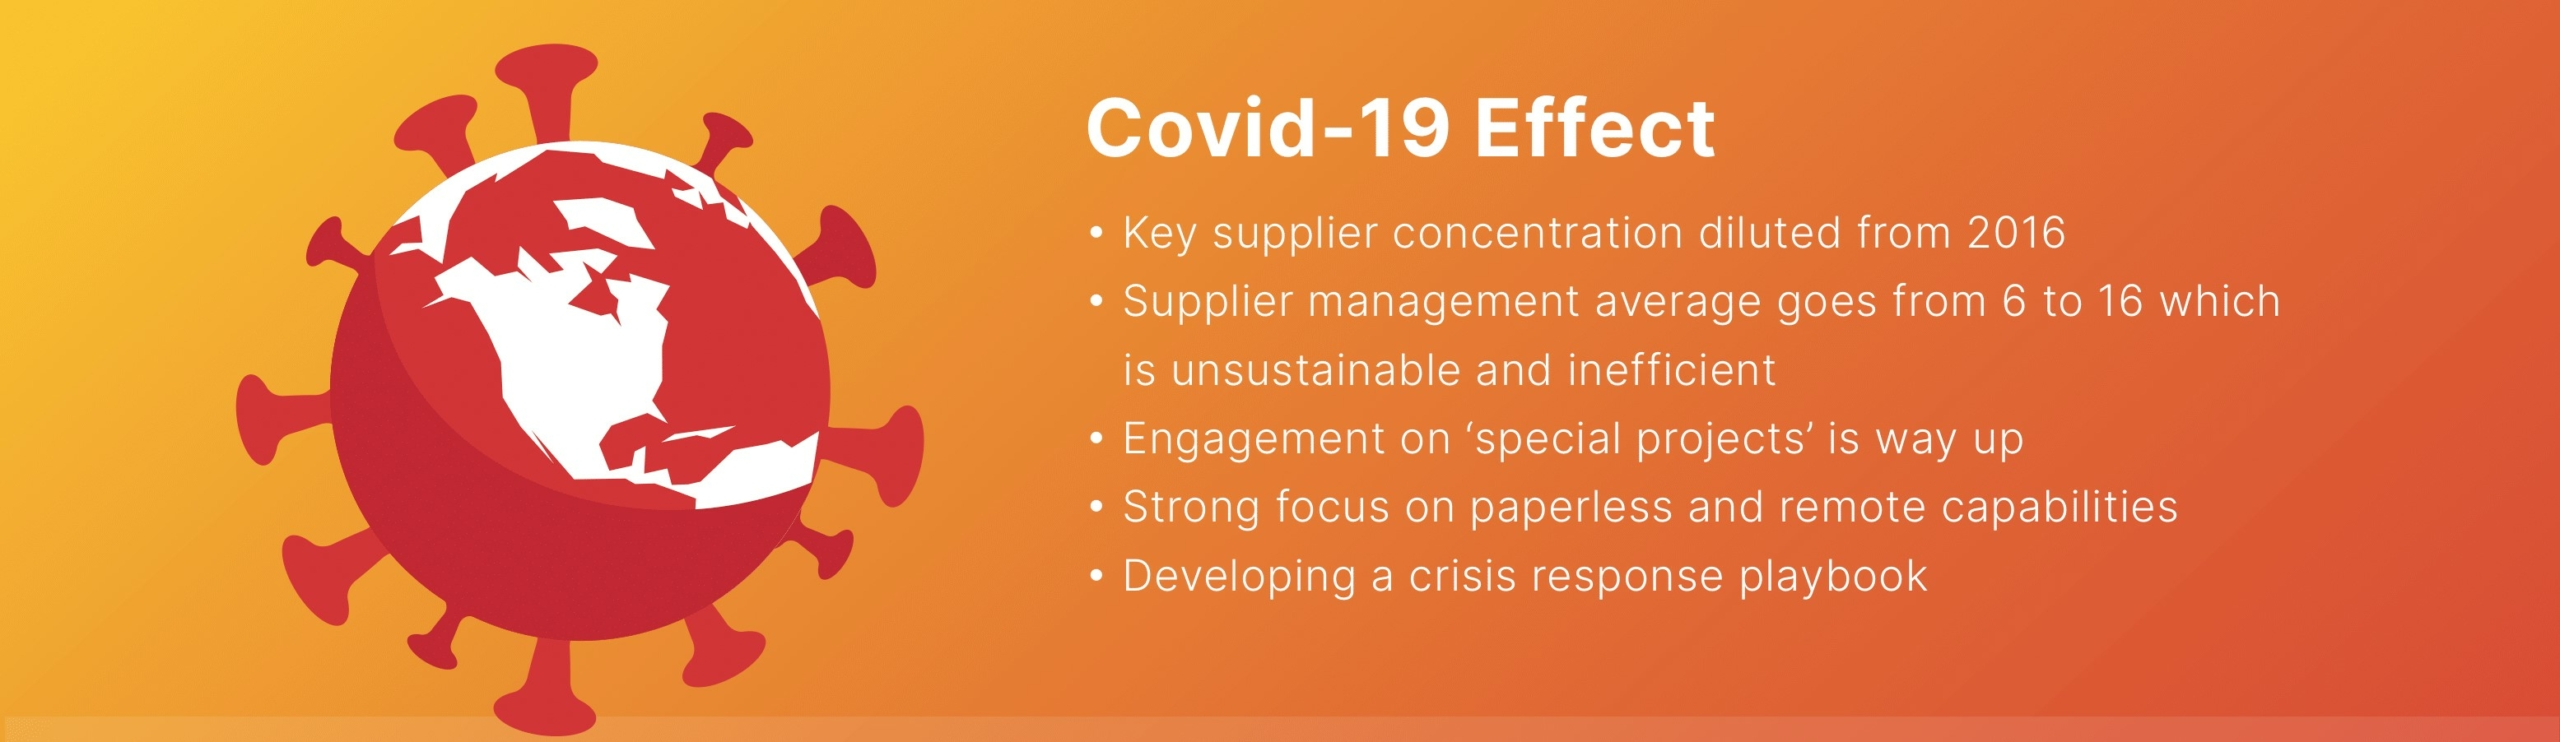 Covid-19 Effect